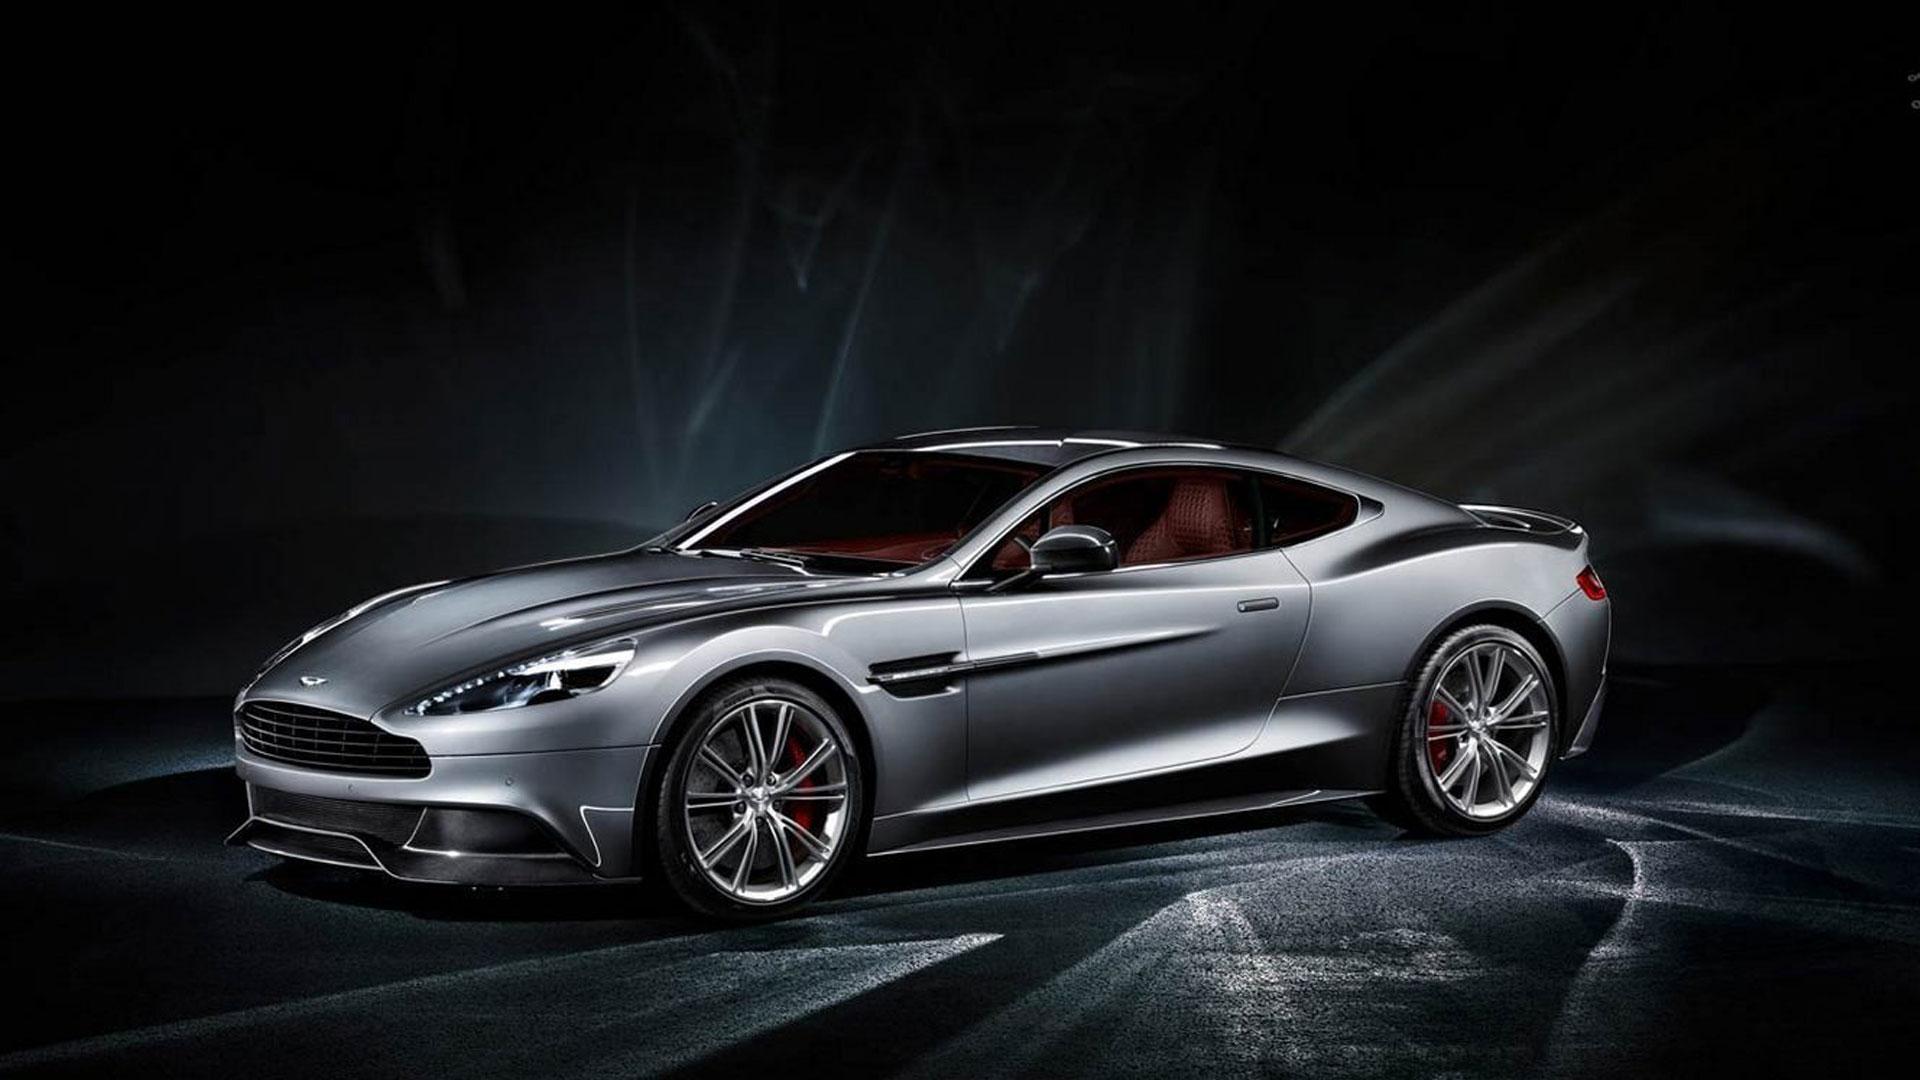 2014 Aston Martin Vanquish Model